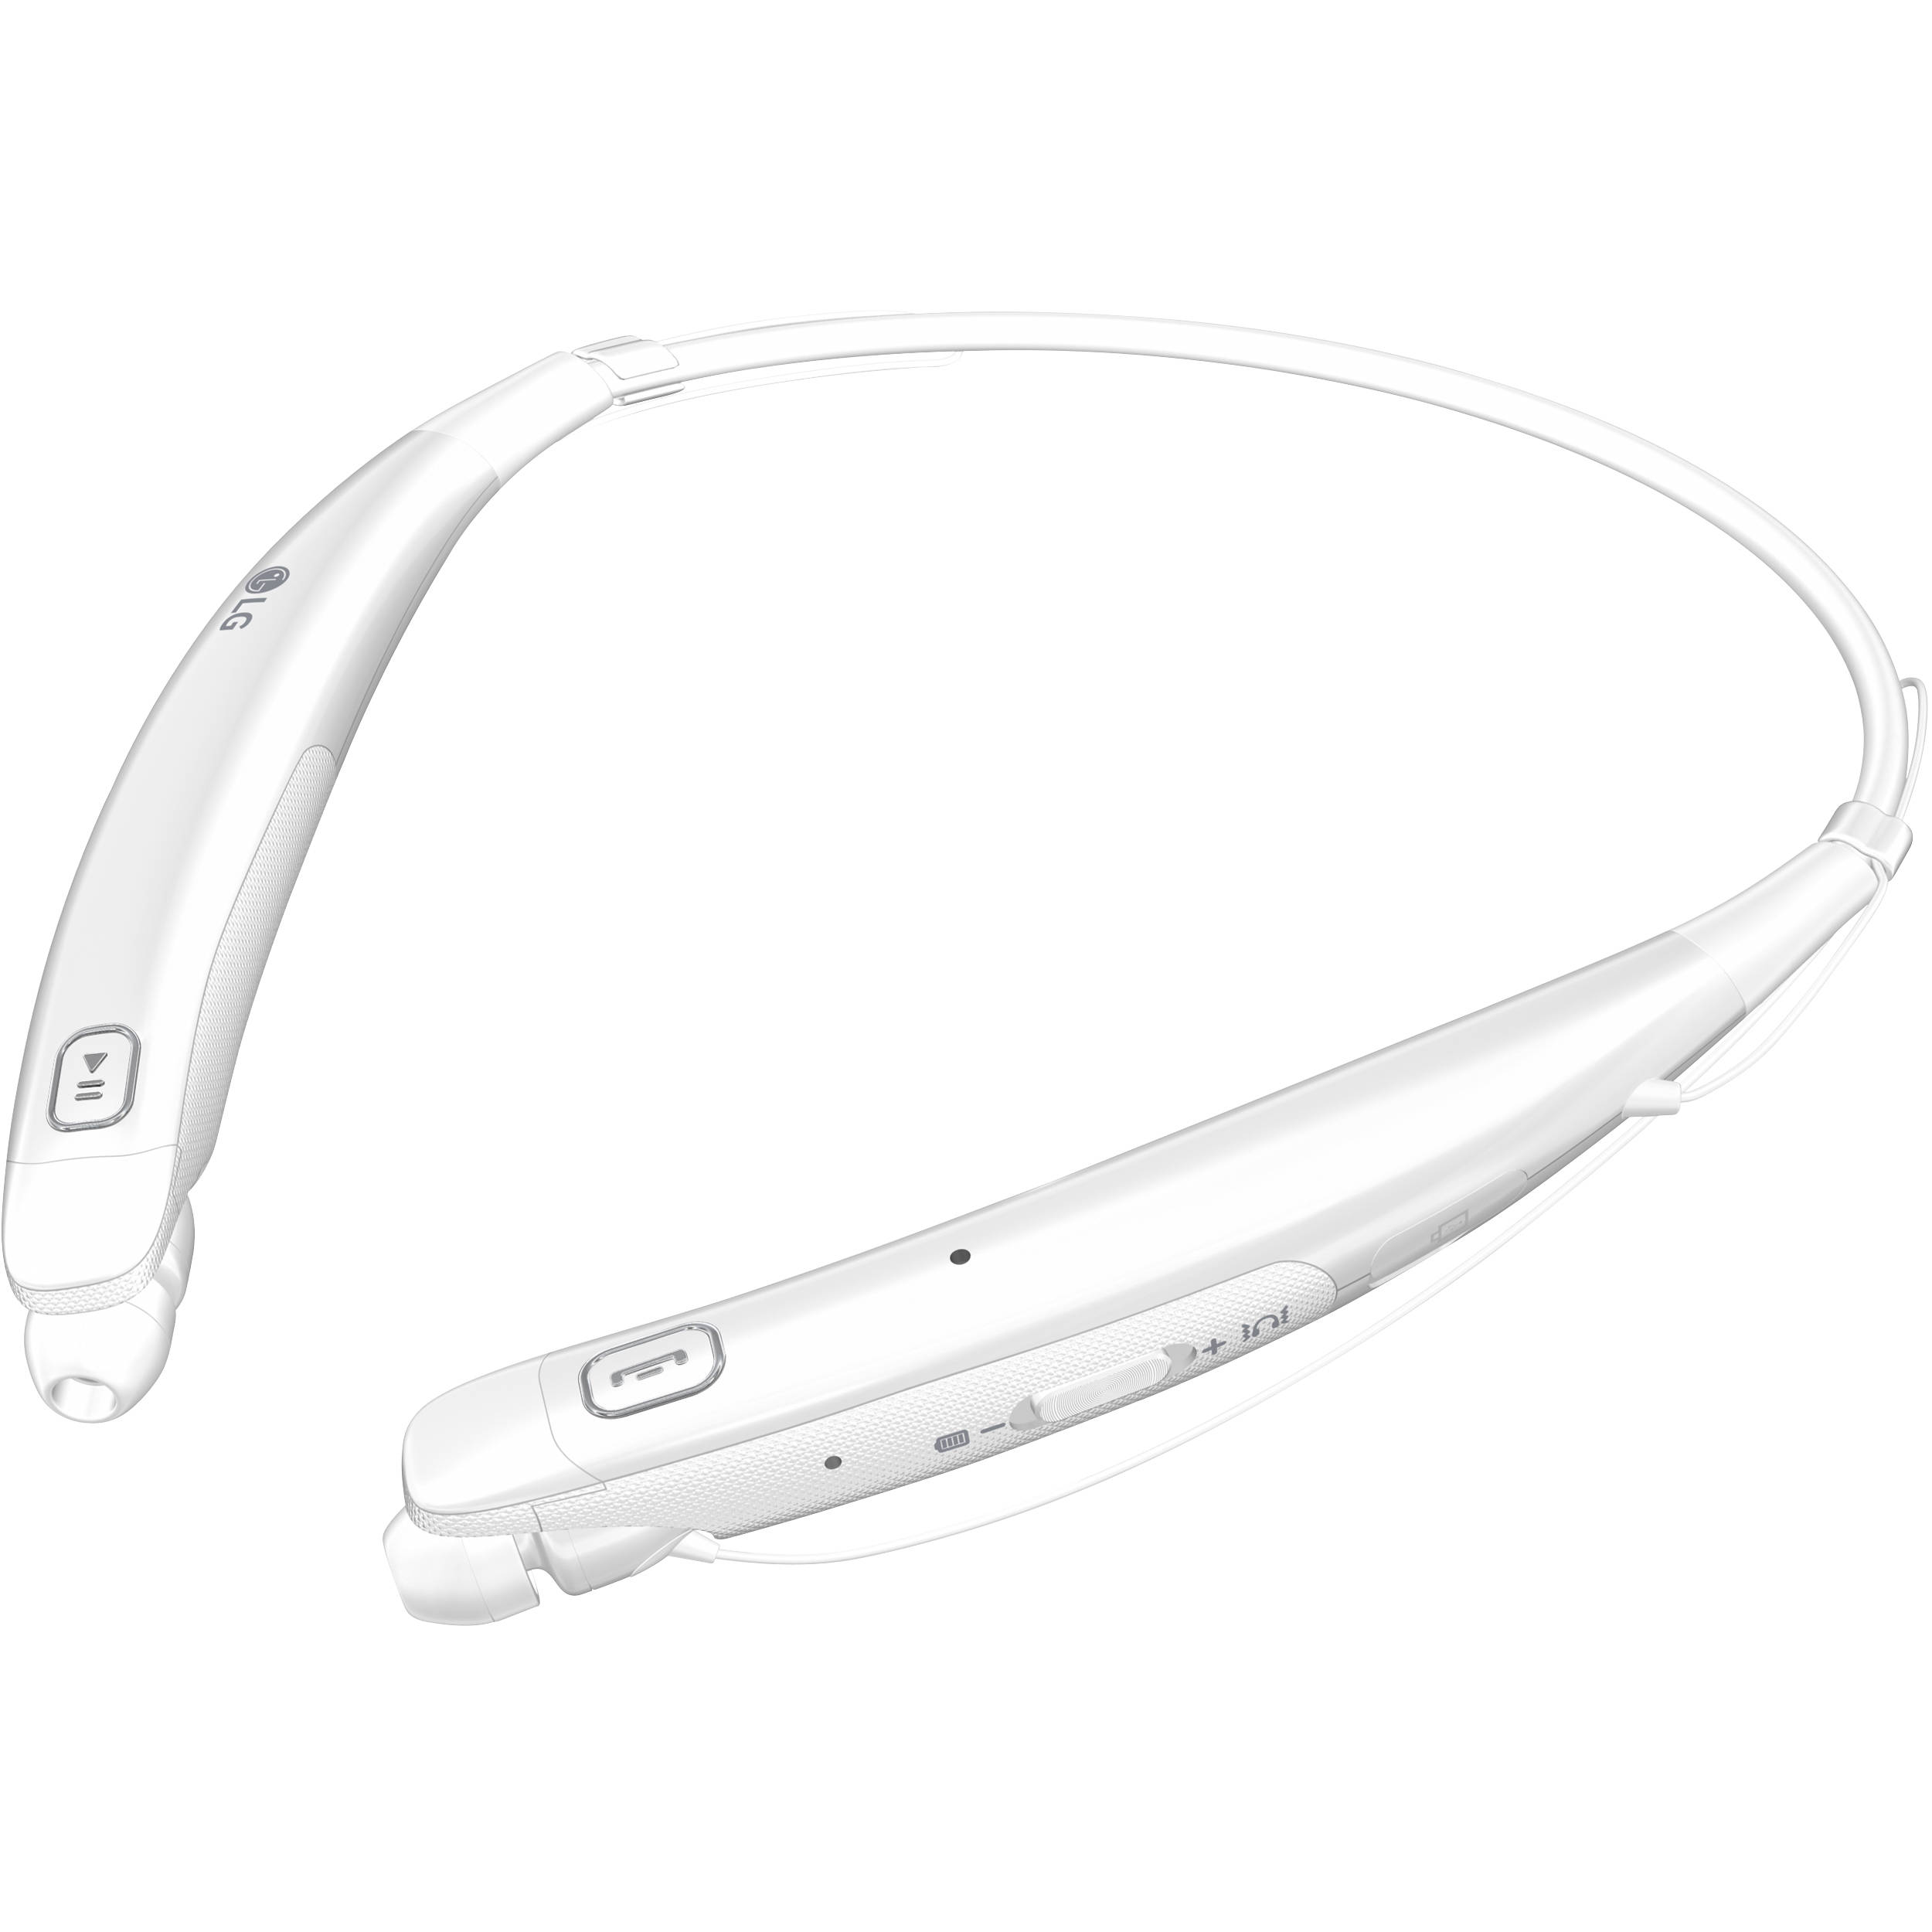 5b31768eadf LG HBS-770 TONE PRO Wireless Stereo Headset HBS-770.ACUSWHI B&H